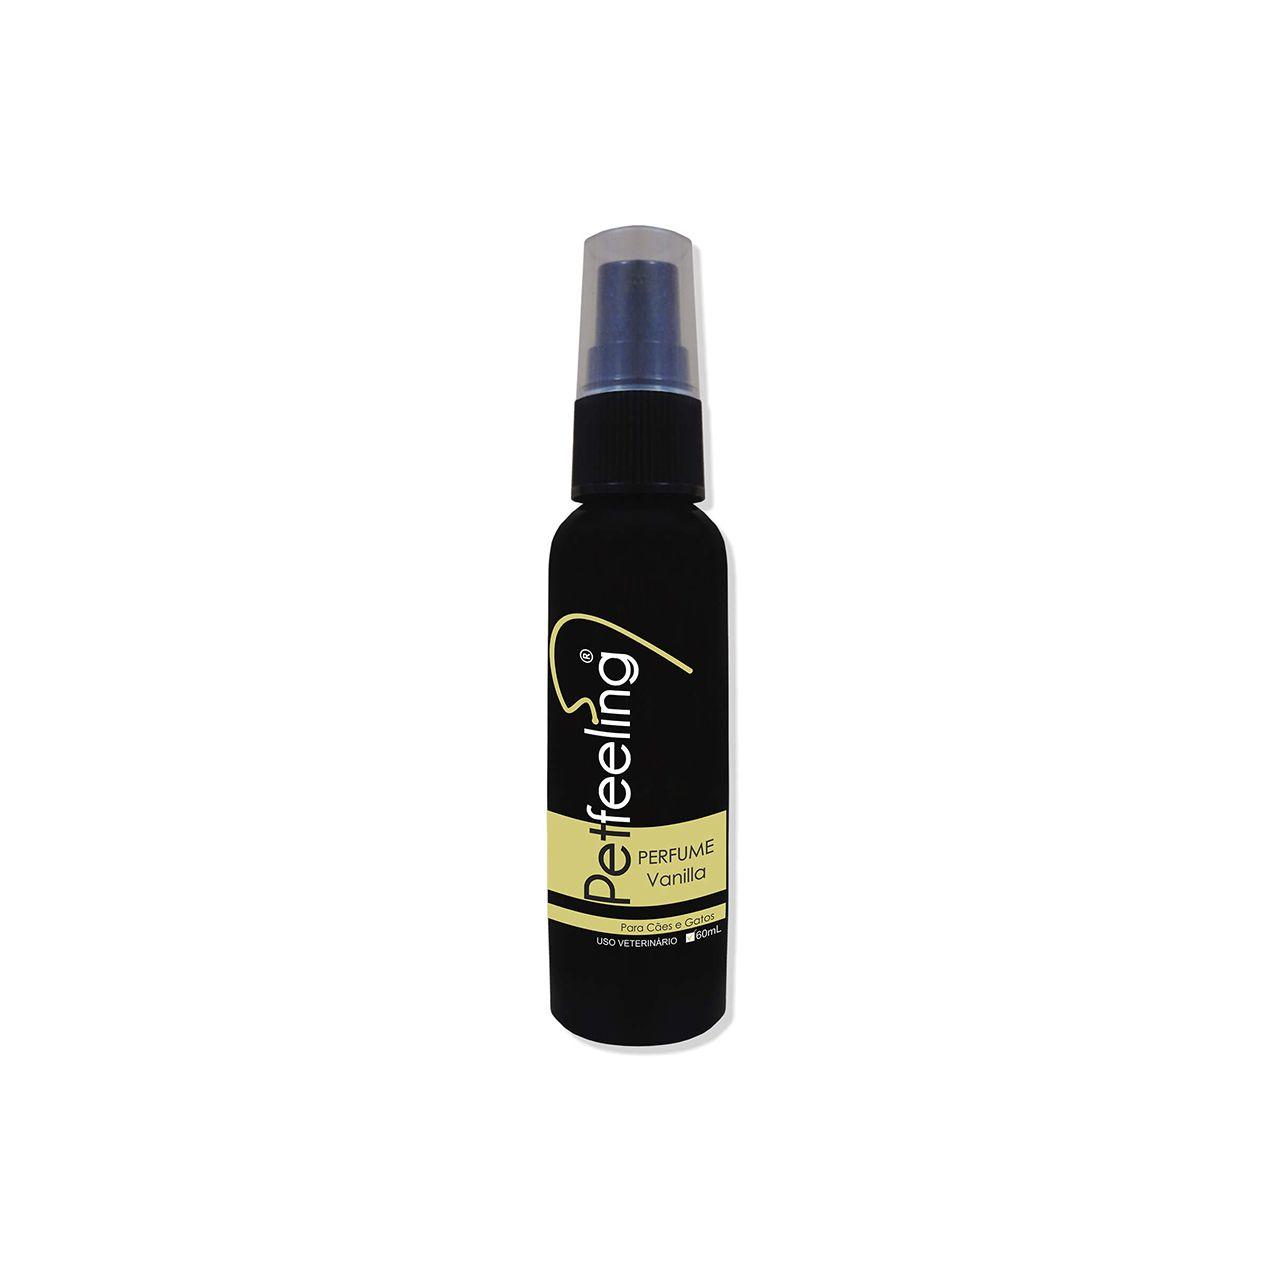 Perfume Vanilla Pet Feeling 60ml